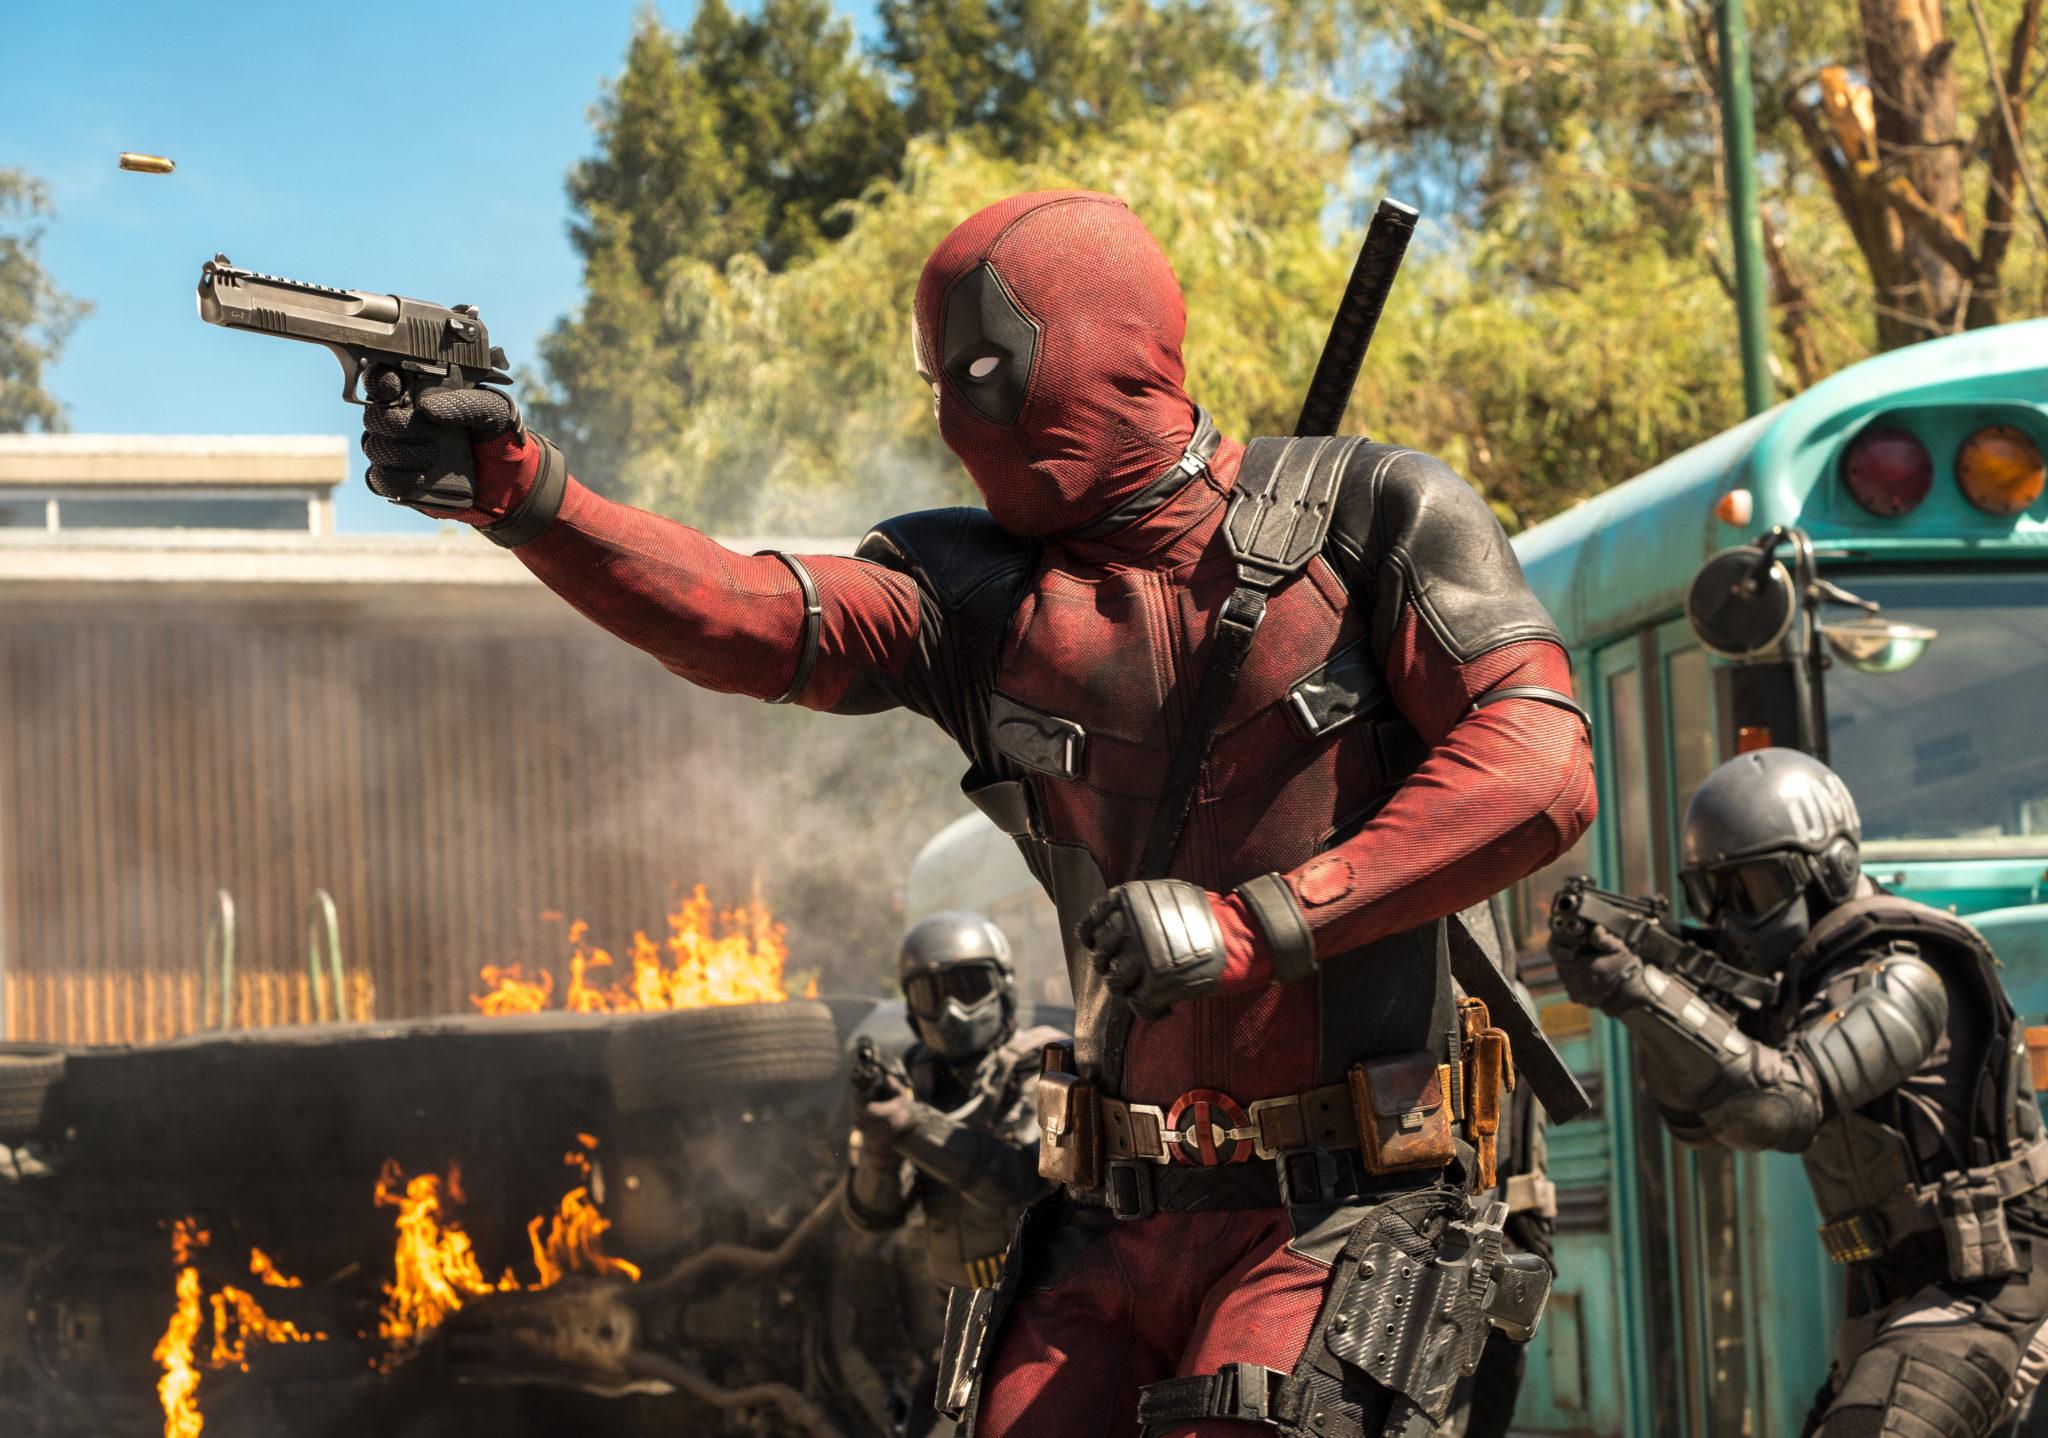 David E. Kelley | Star adds more movies to Disney+